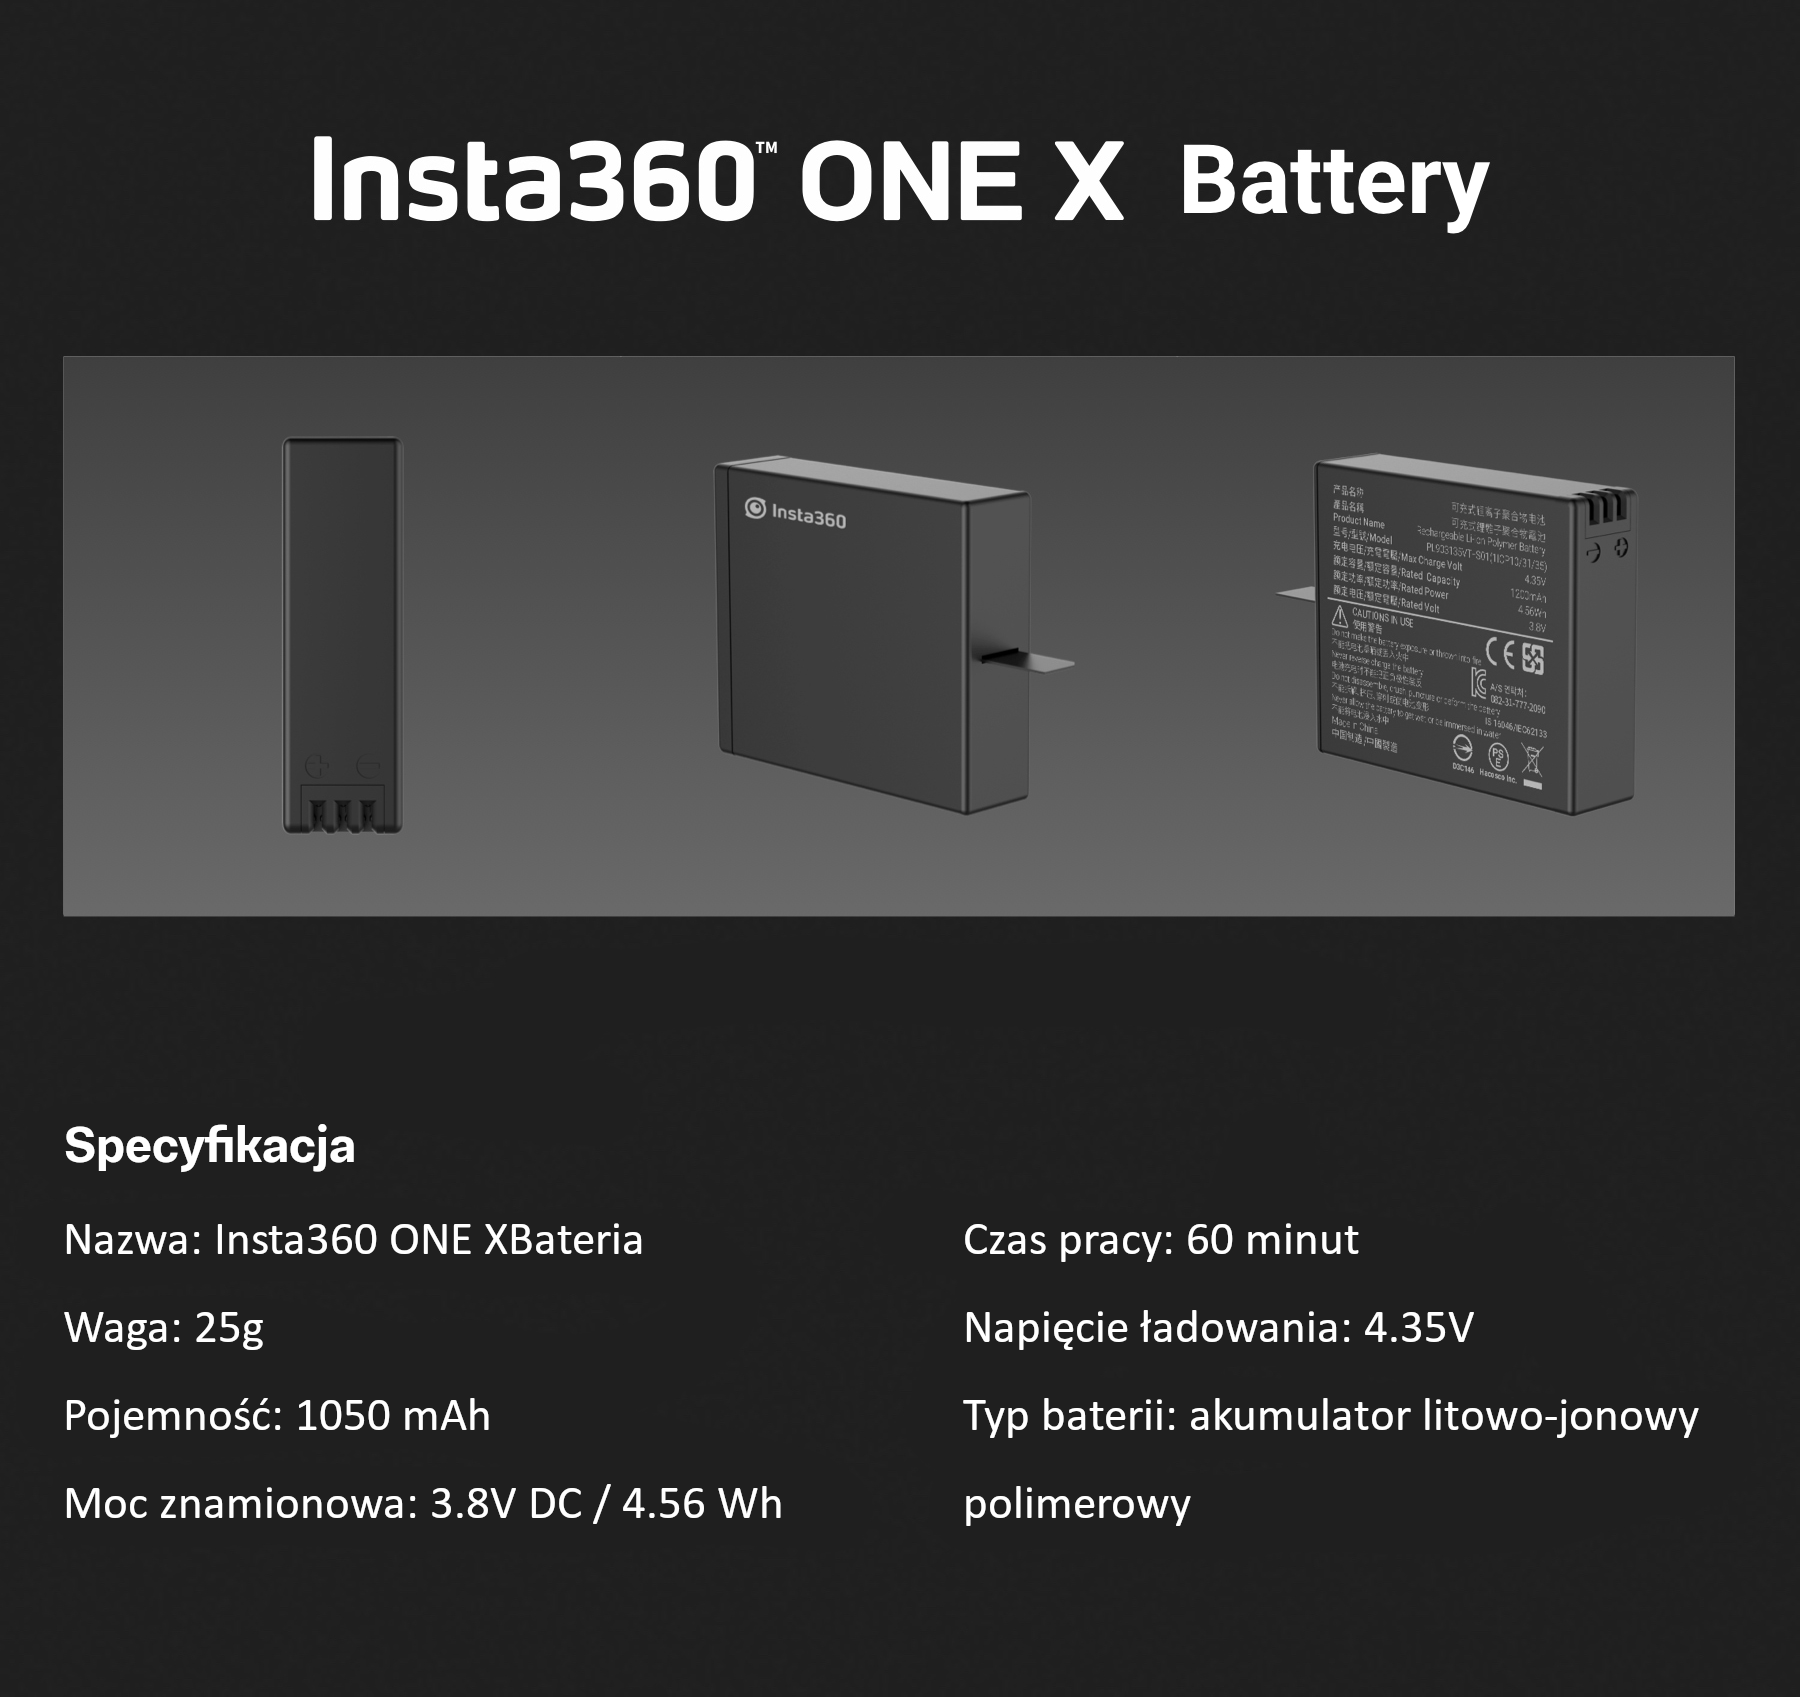 Insta360 ONE X opis bateria 4